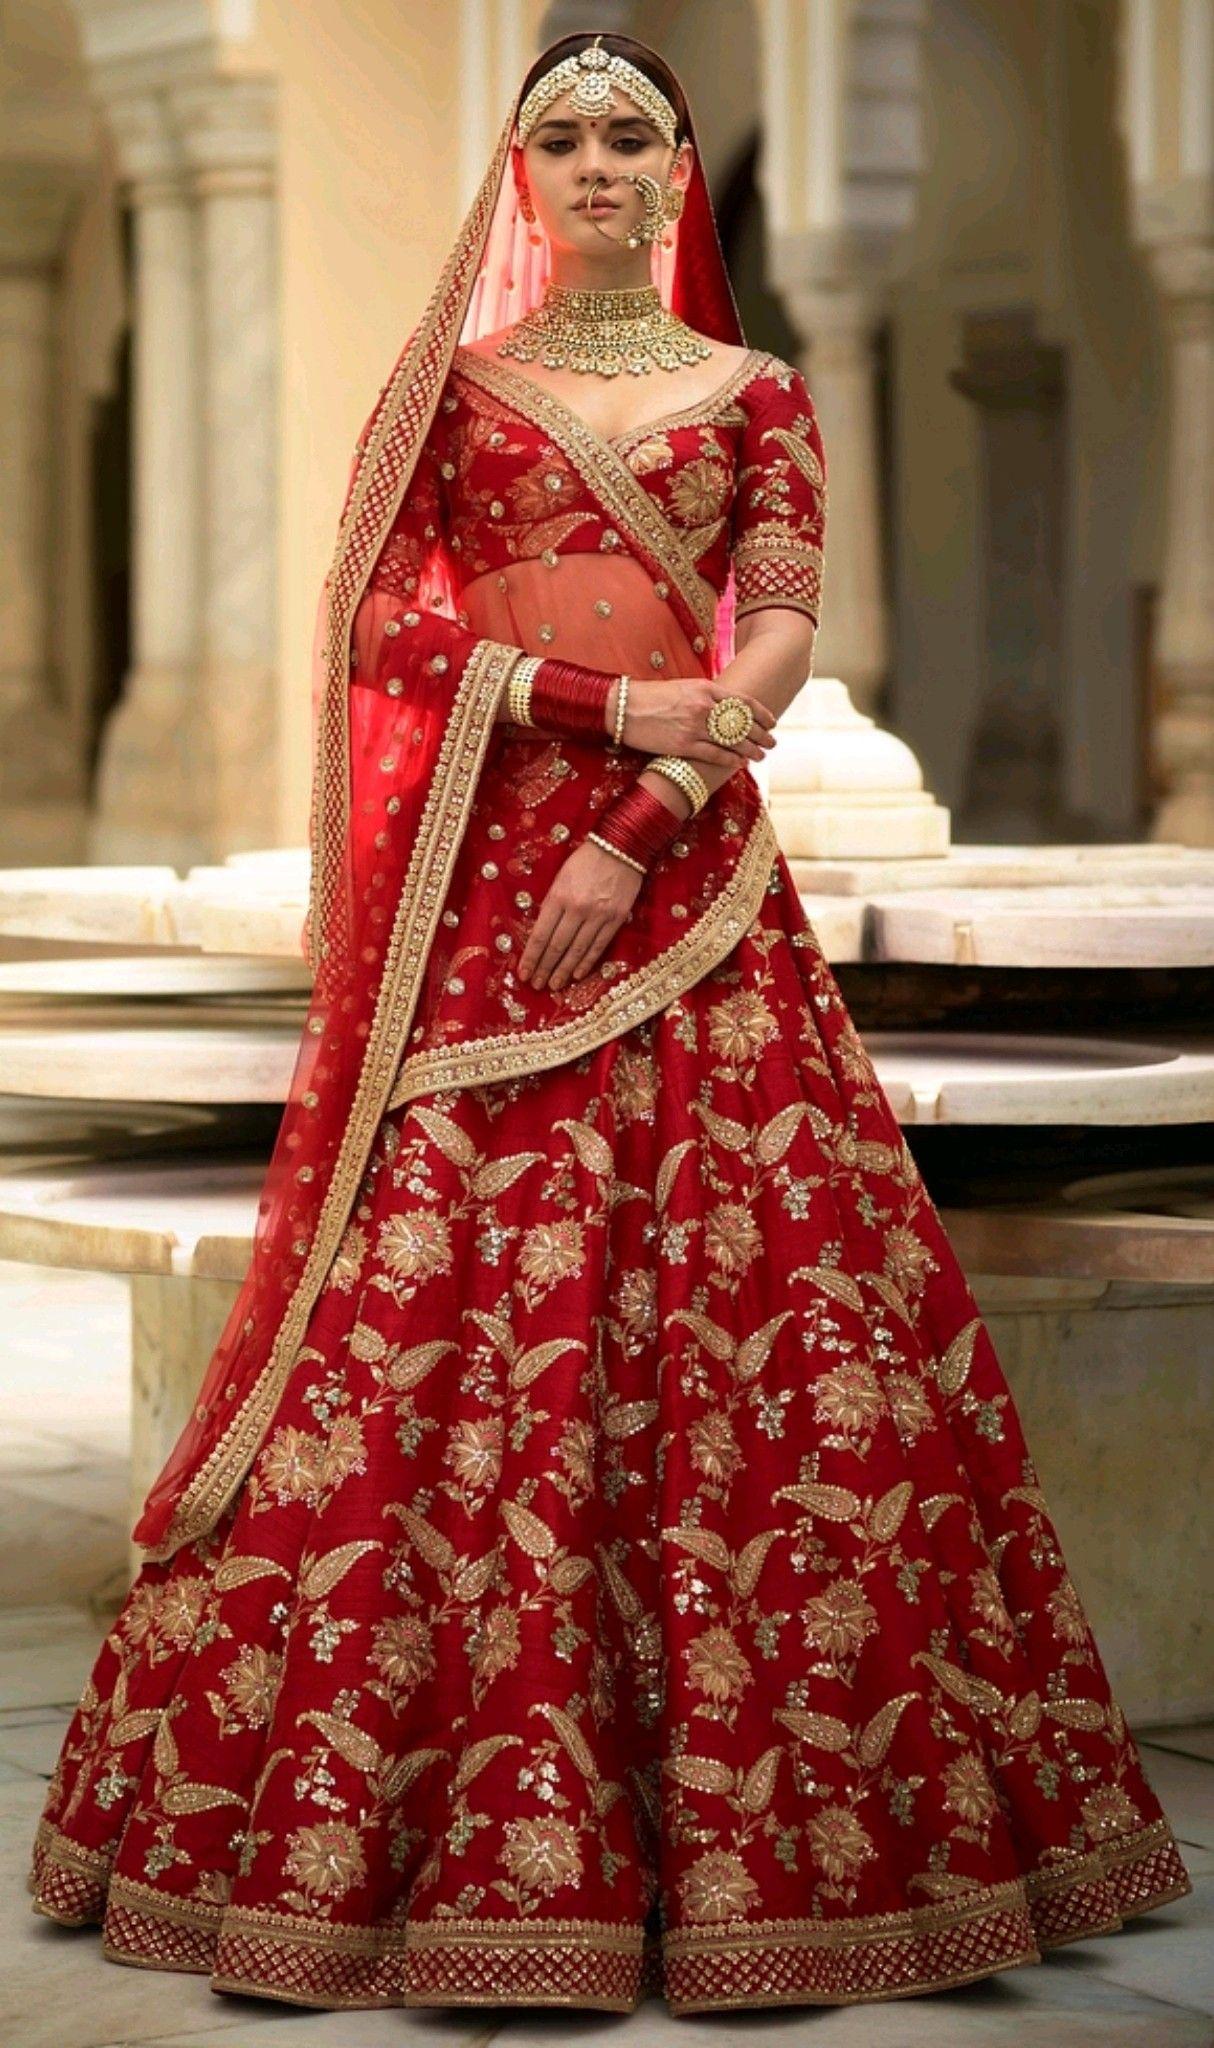 b34343134f17 Sabyasachi Mukherjee 'The Devi Collection' 2018 | Fashion India in ...